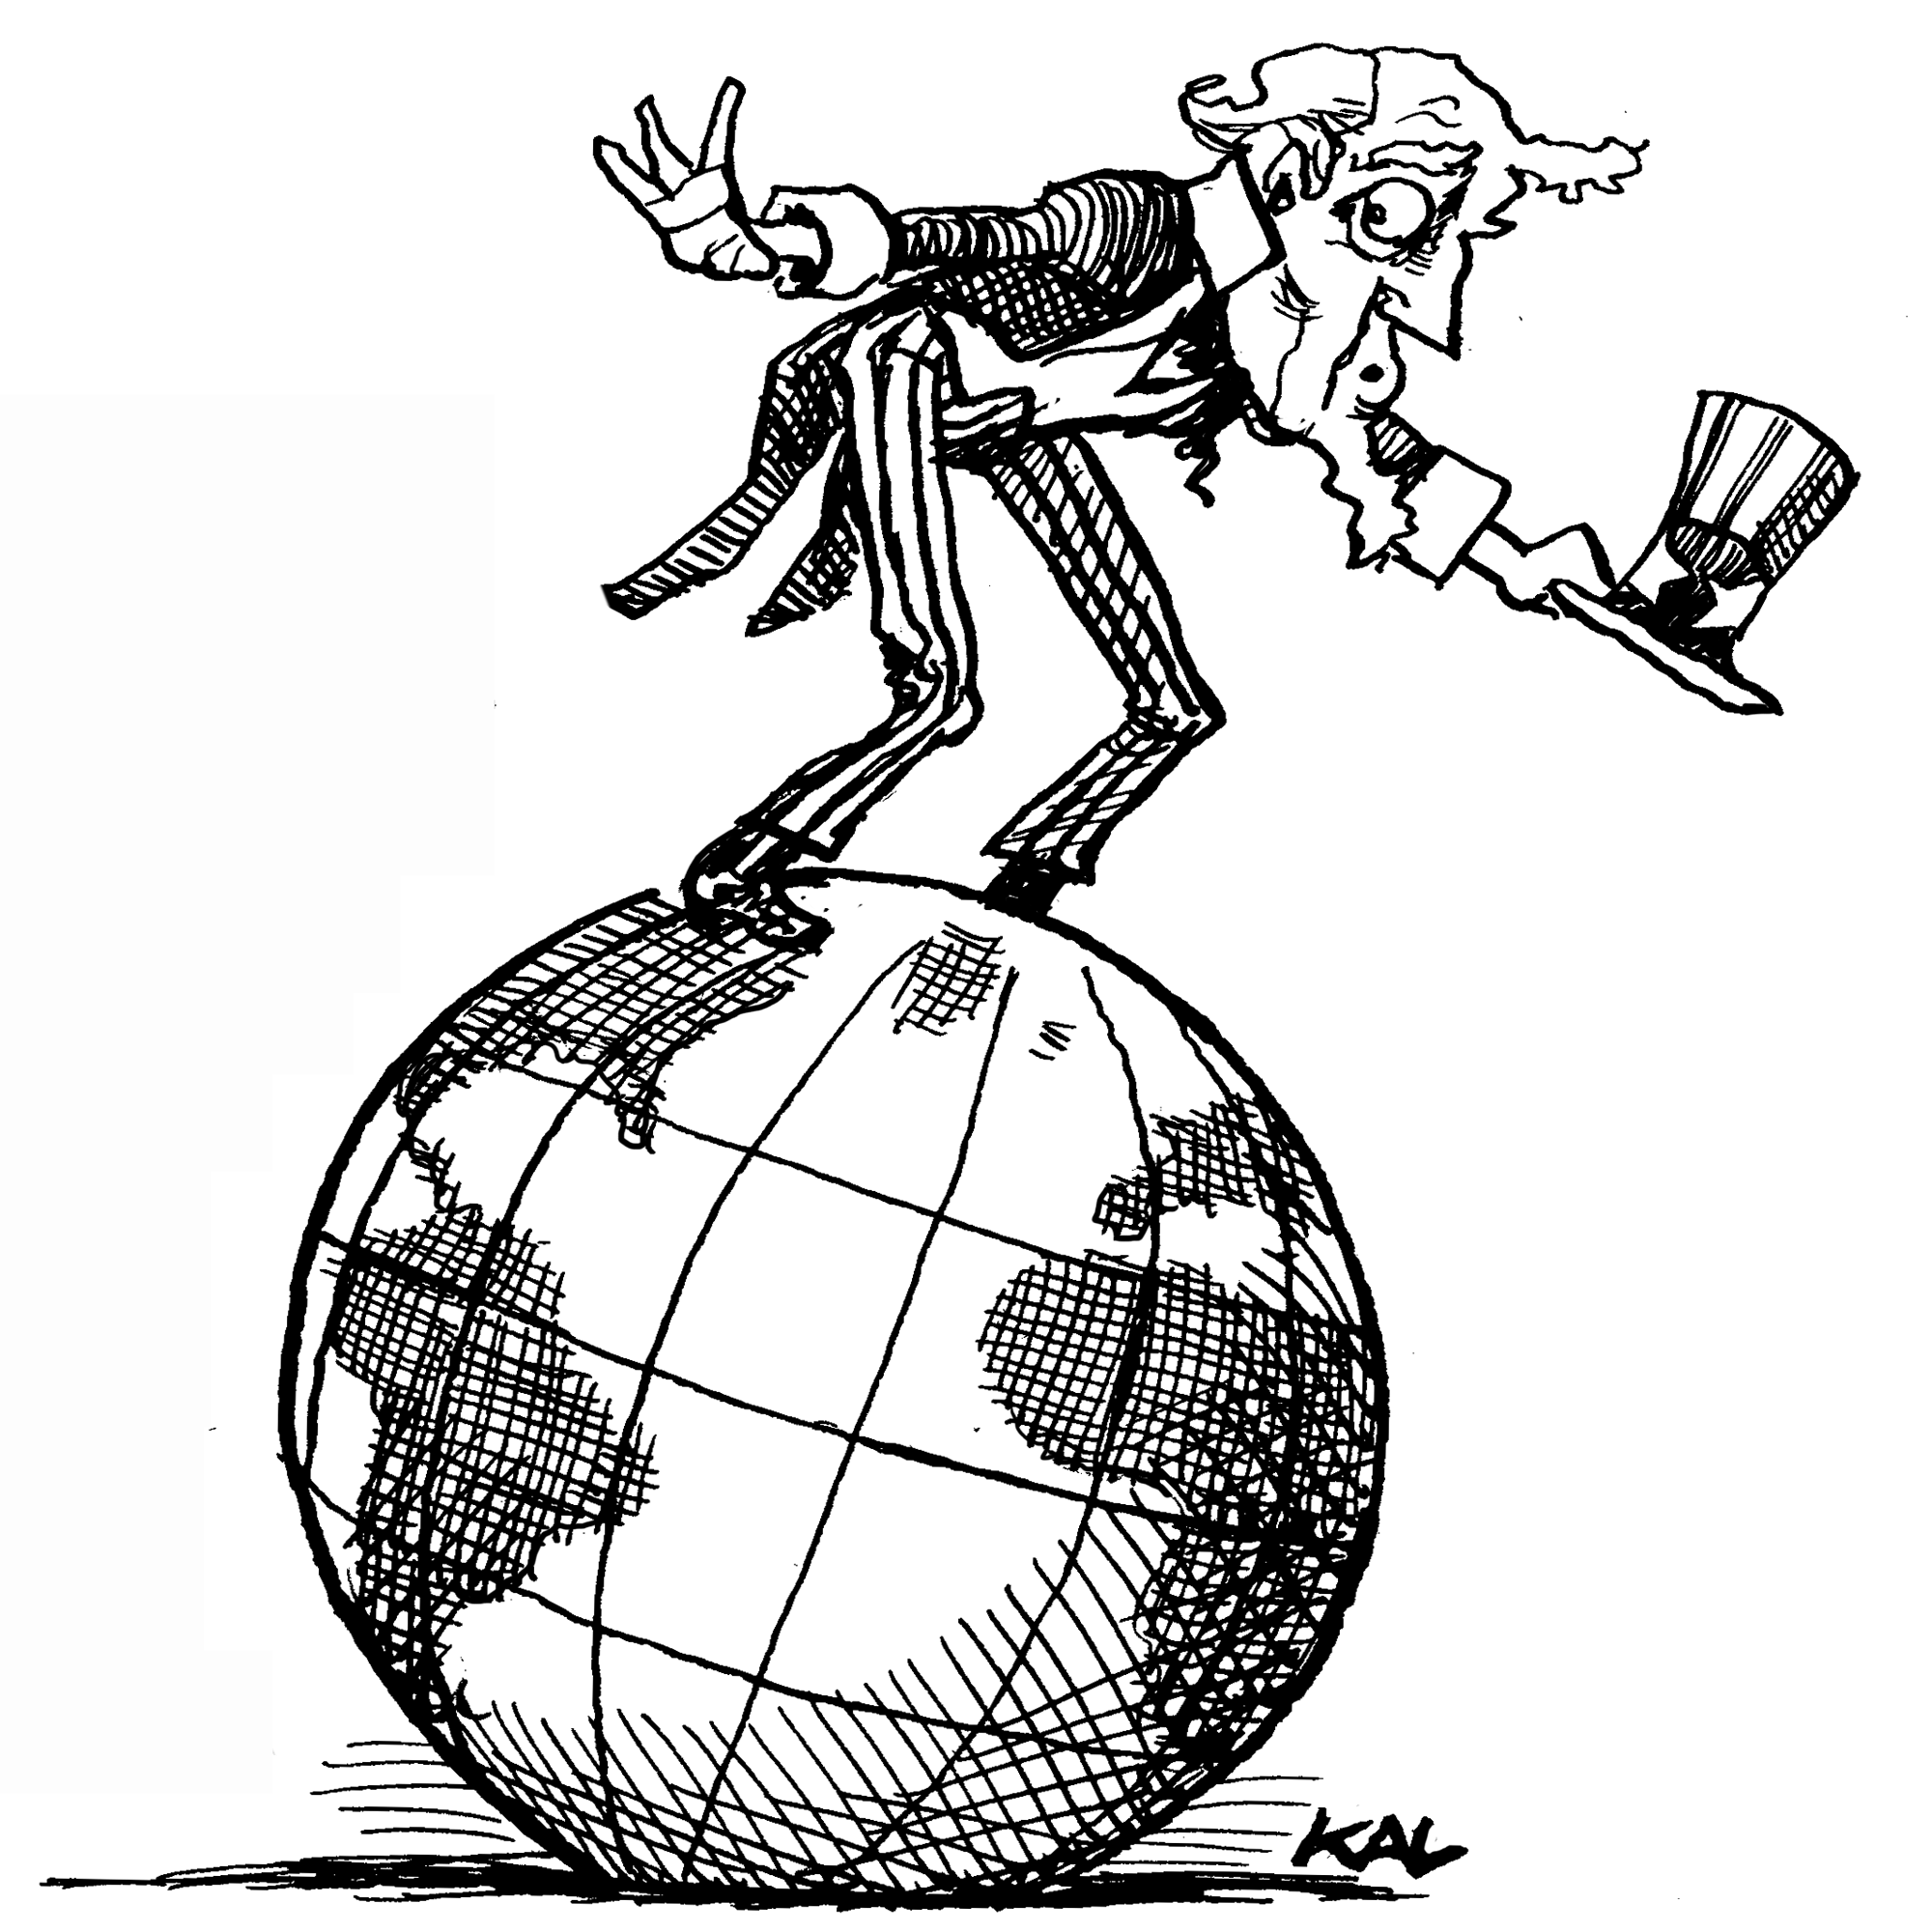 education reform in america essays